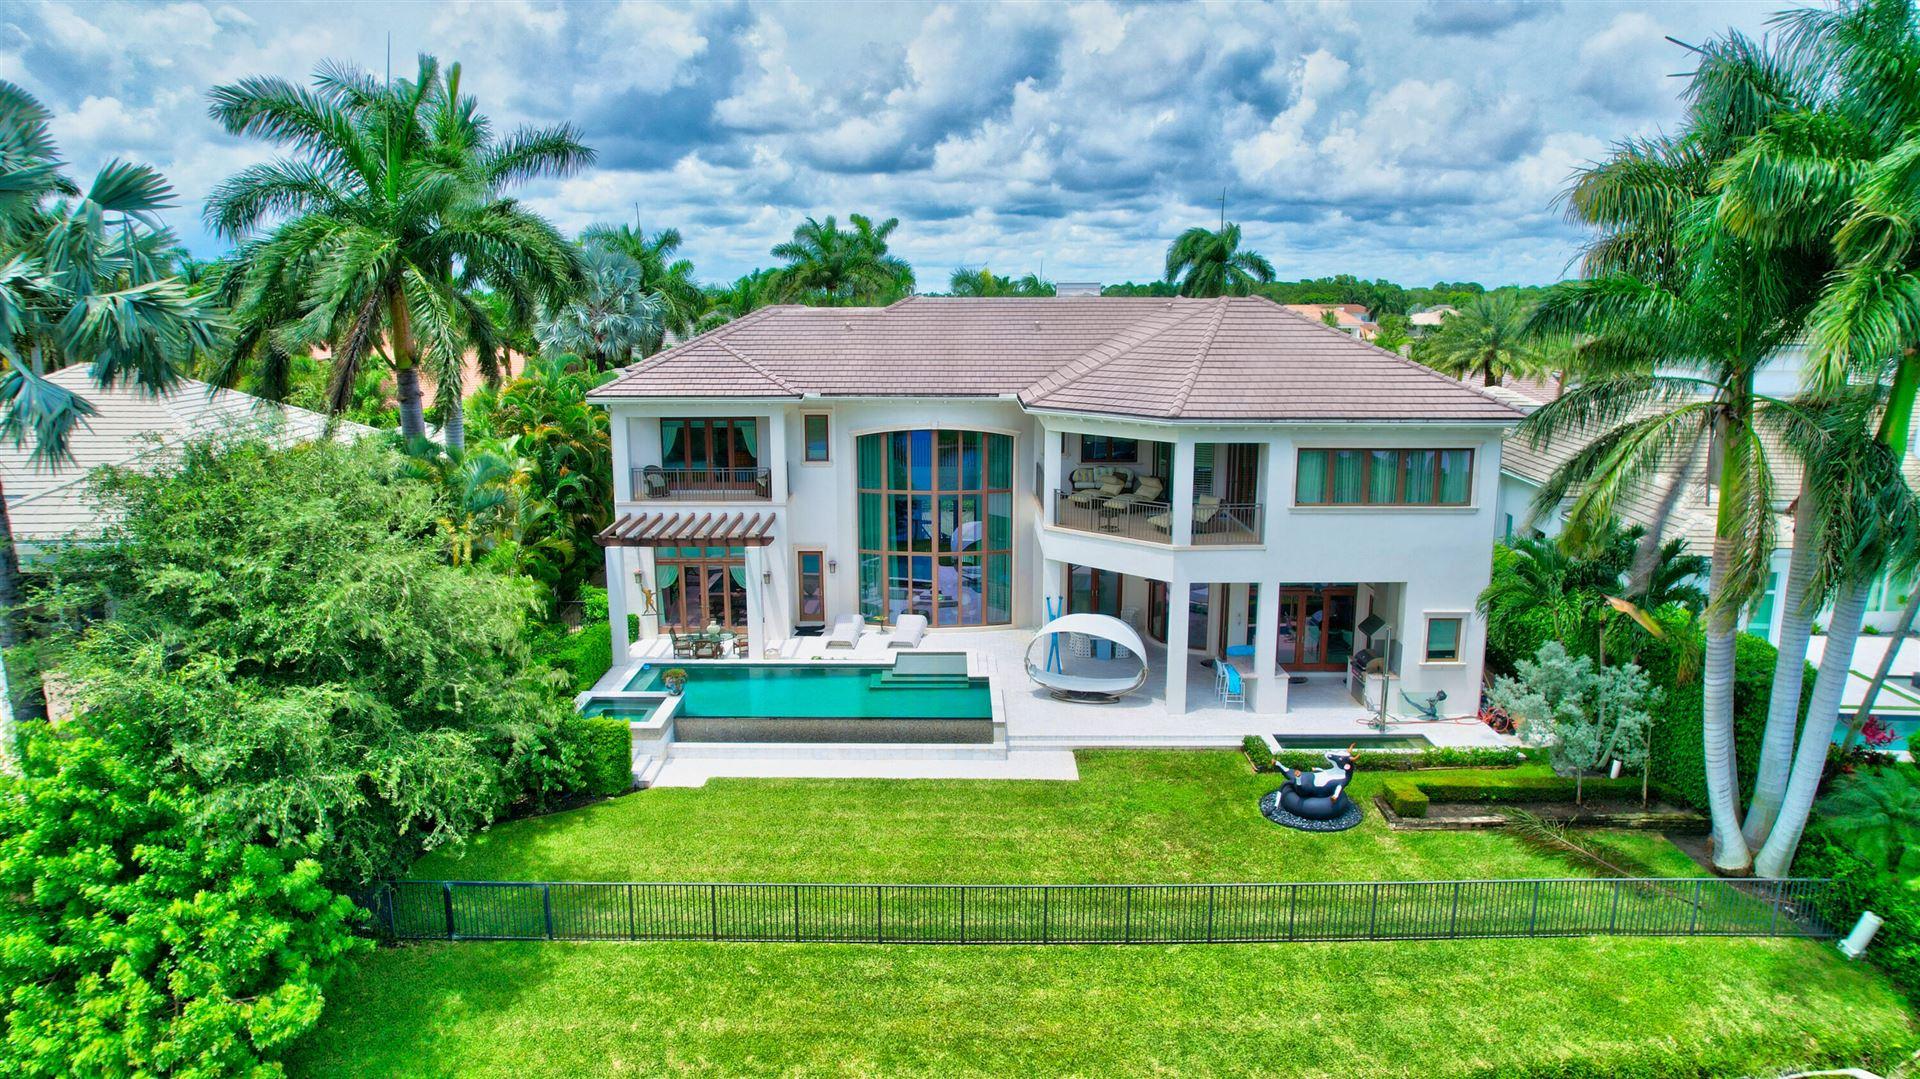 6836 Queenferry Circle, Boca Raton, FL 33496 - MLS#: RX-10737244